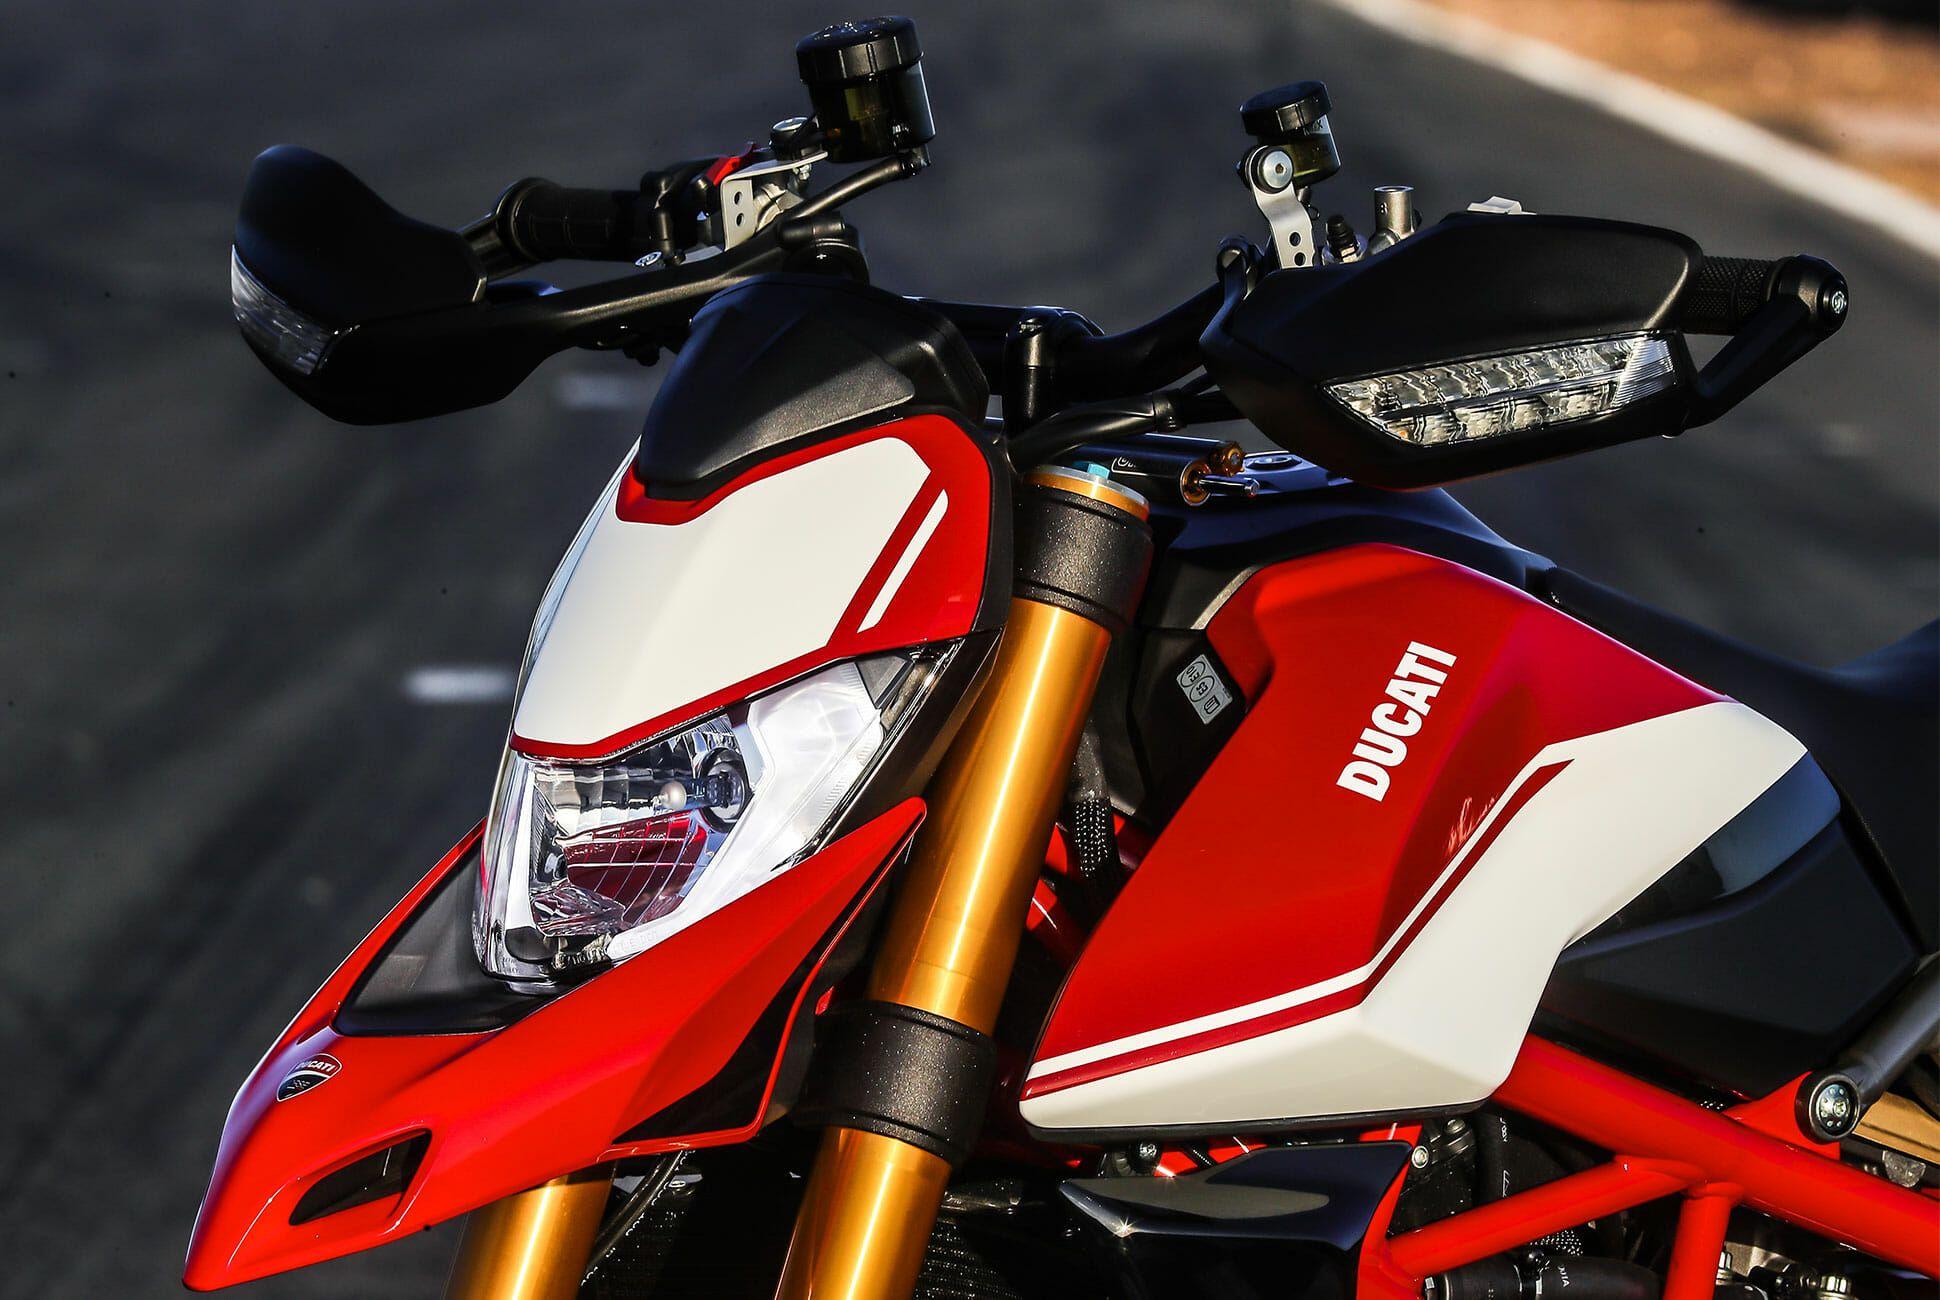 Ducati-Hypermotard-950-SP-Review-gear-patrol-slide-2